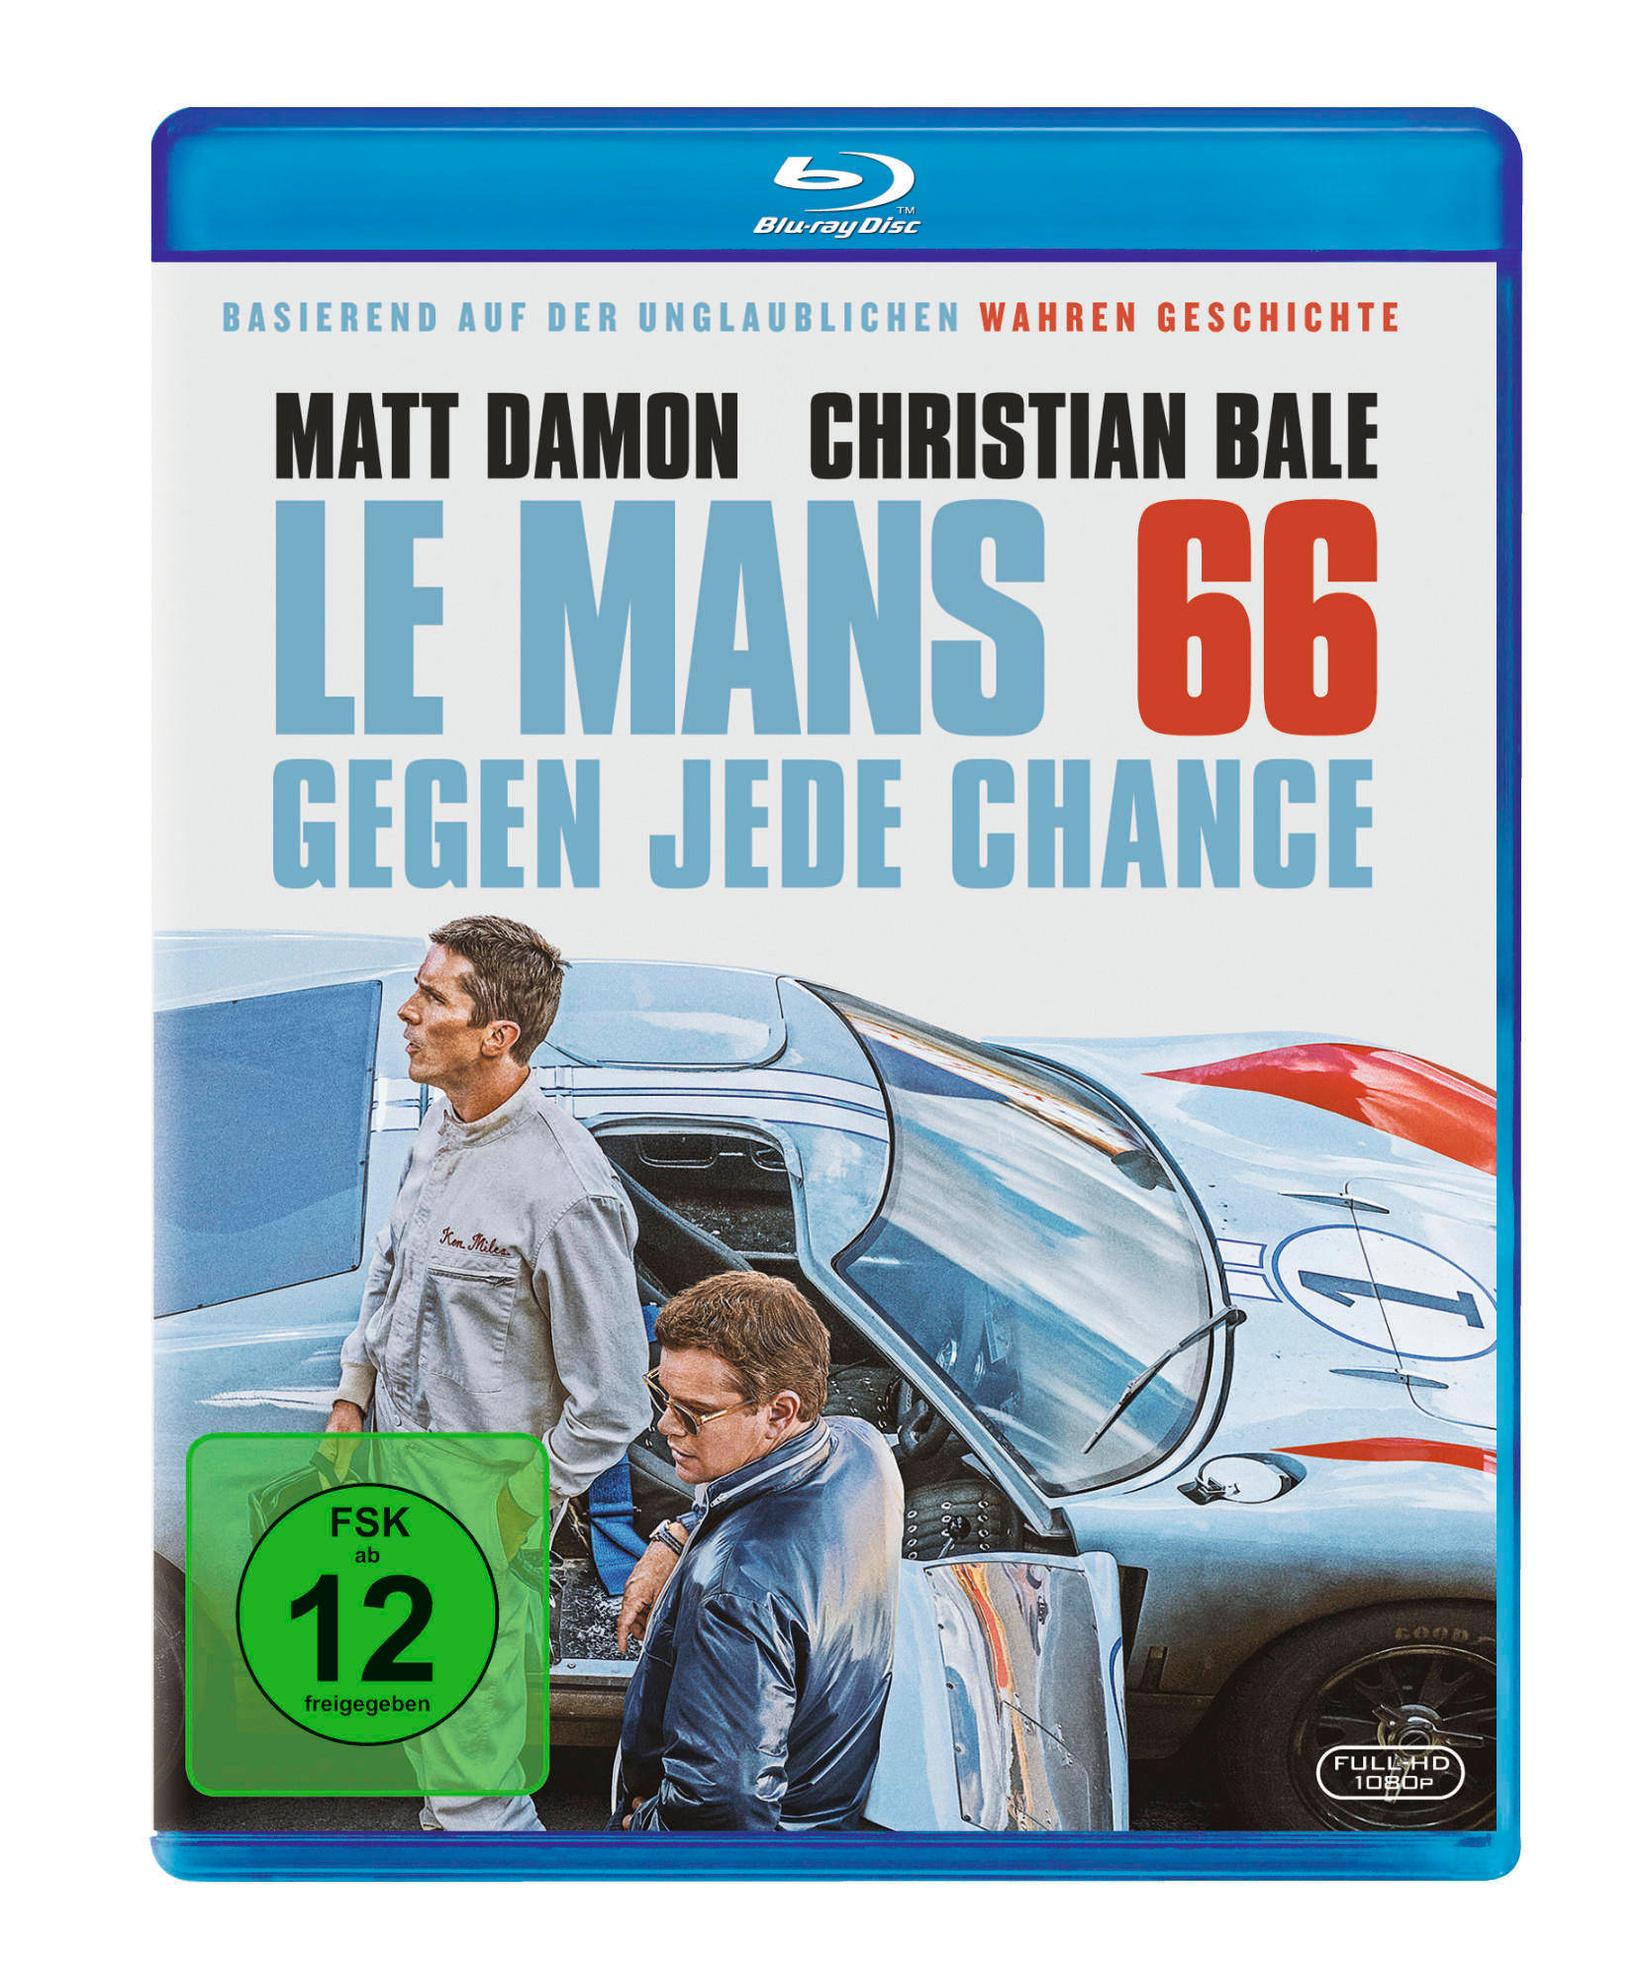 Le Mans 66 Gegen Jede Chance Blu Ray Bei Weltbild De Kaufen